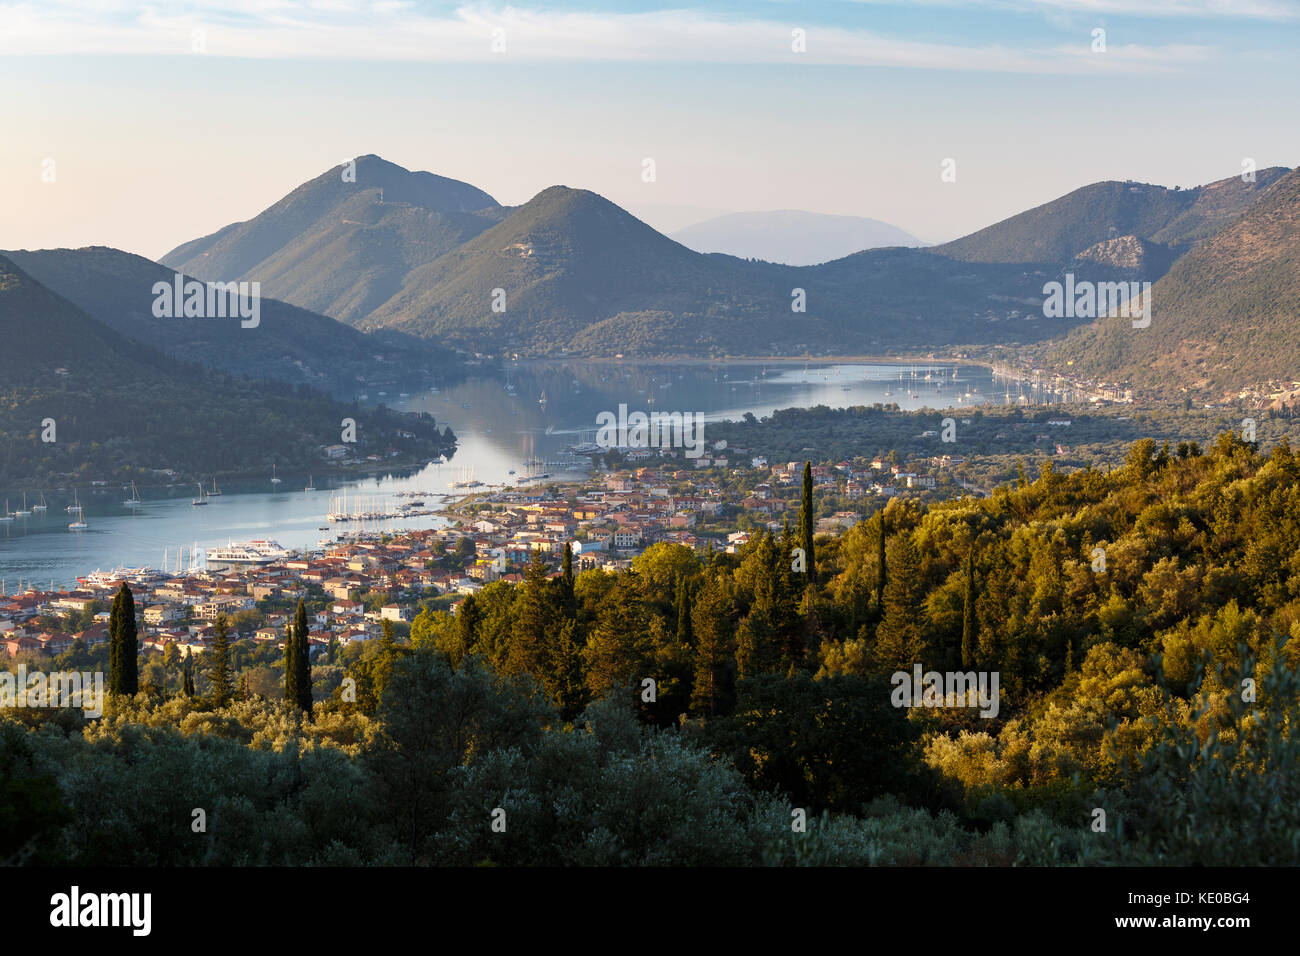 Nydri village on Lefkada island in Greece. - Stock Image